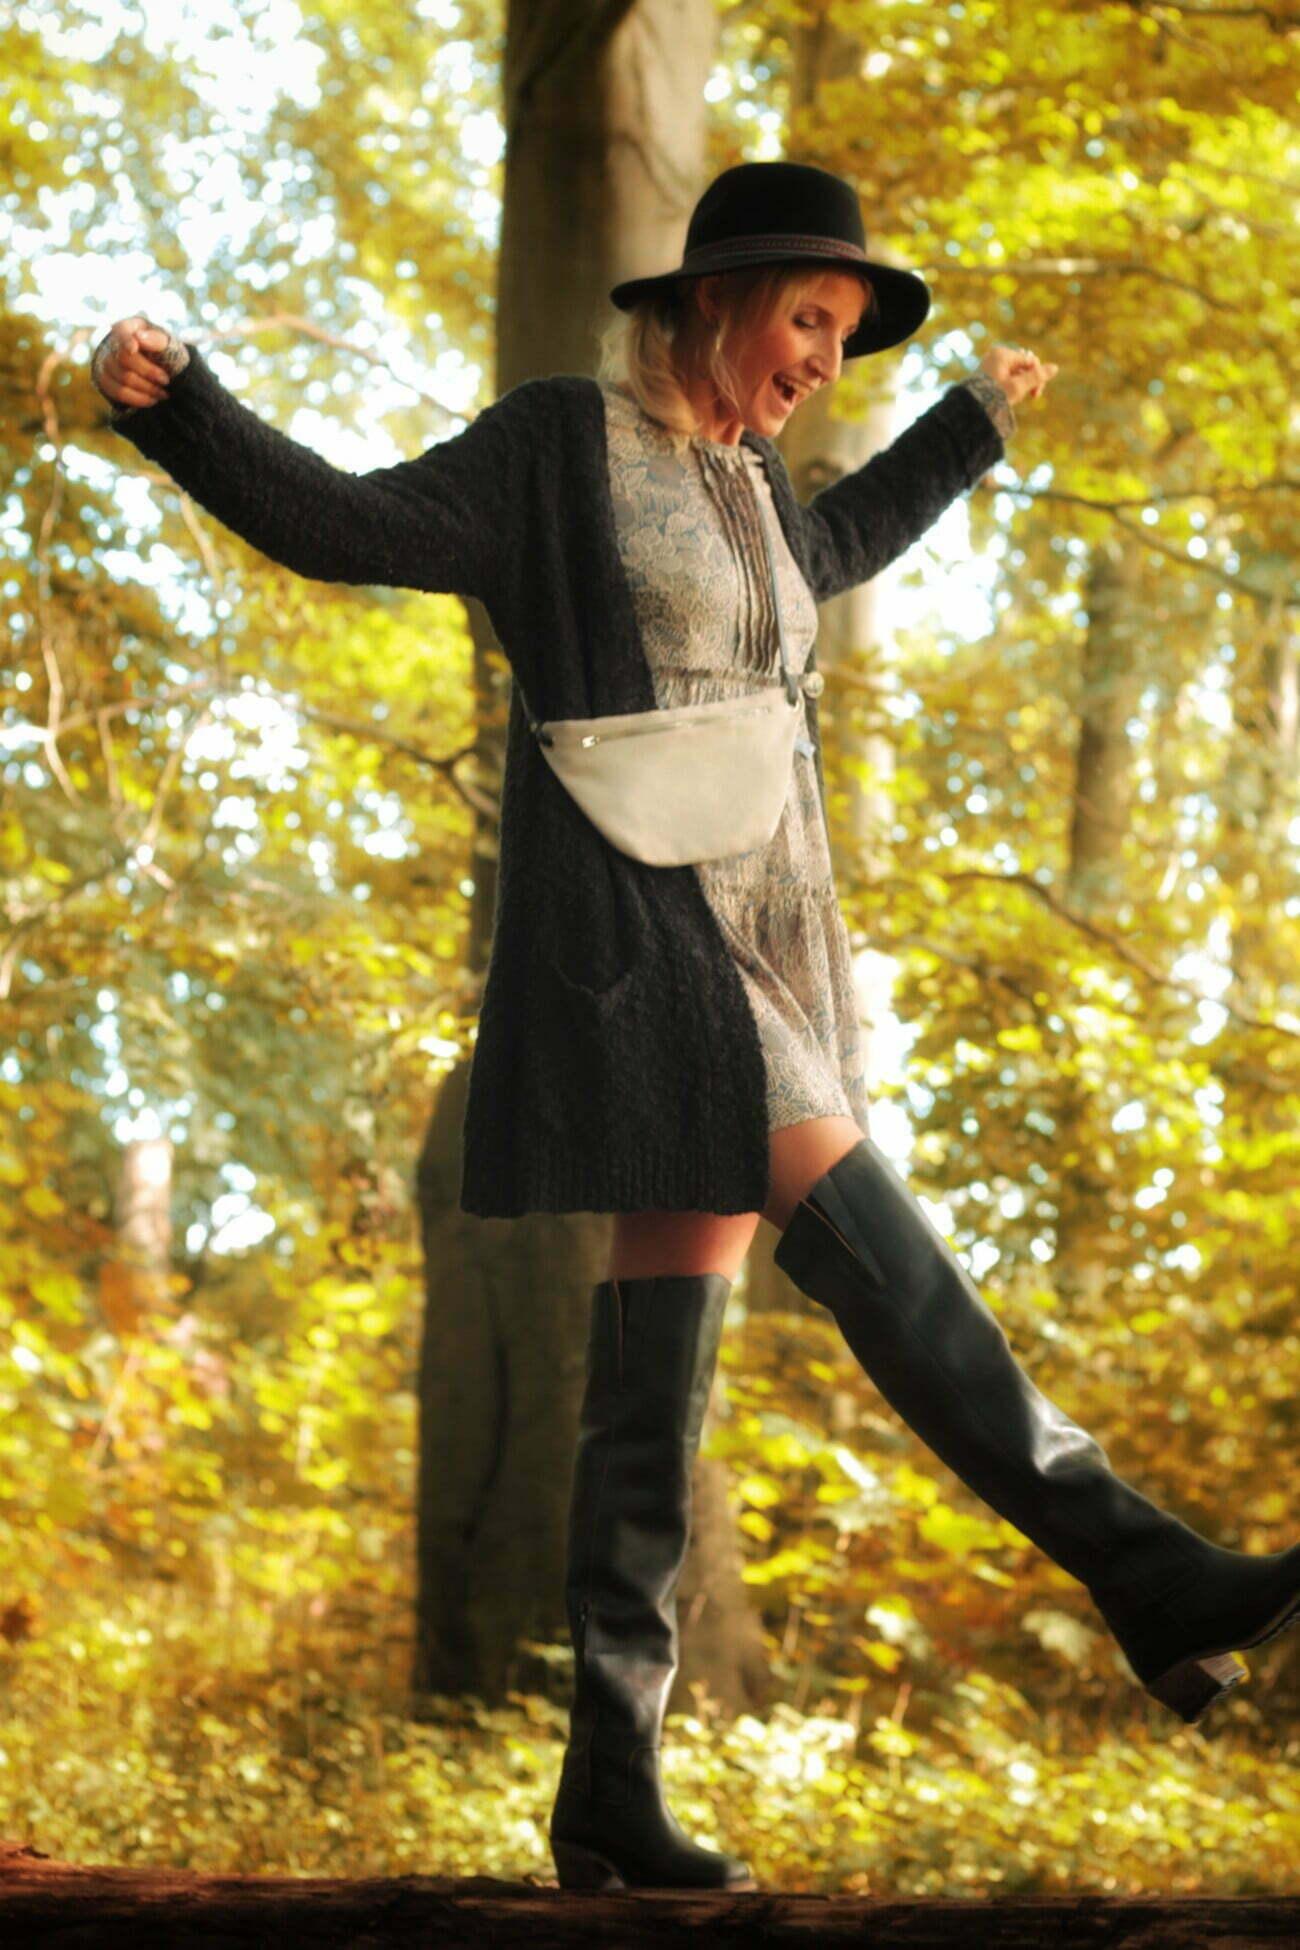 boho herbst outfit ideen - die besten herbst outfits im